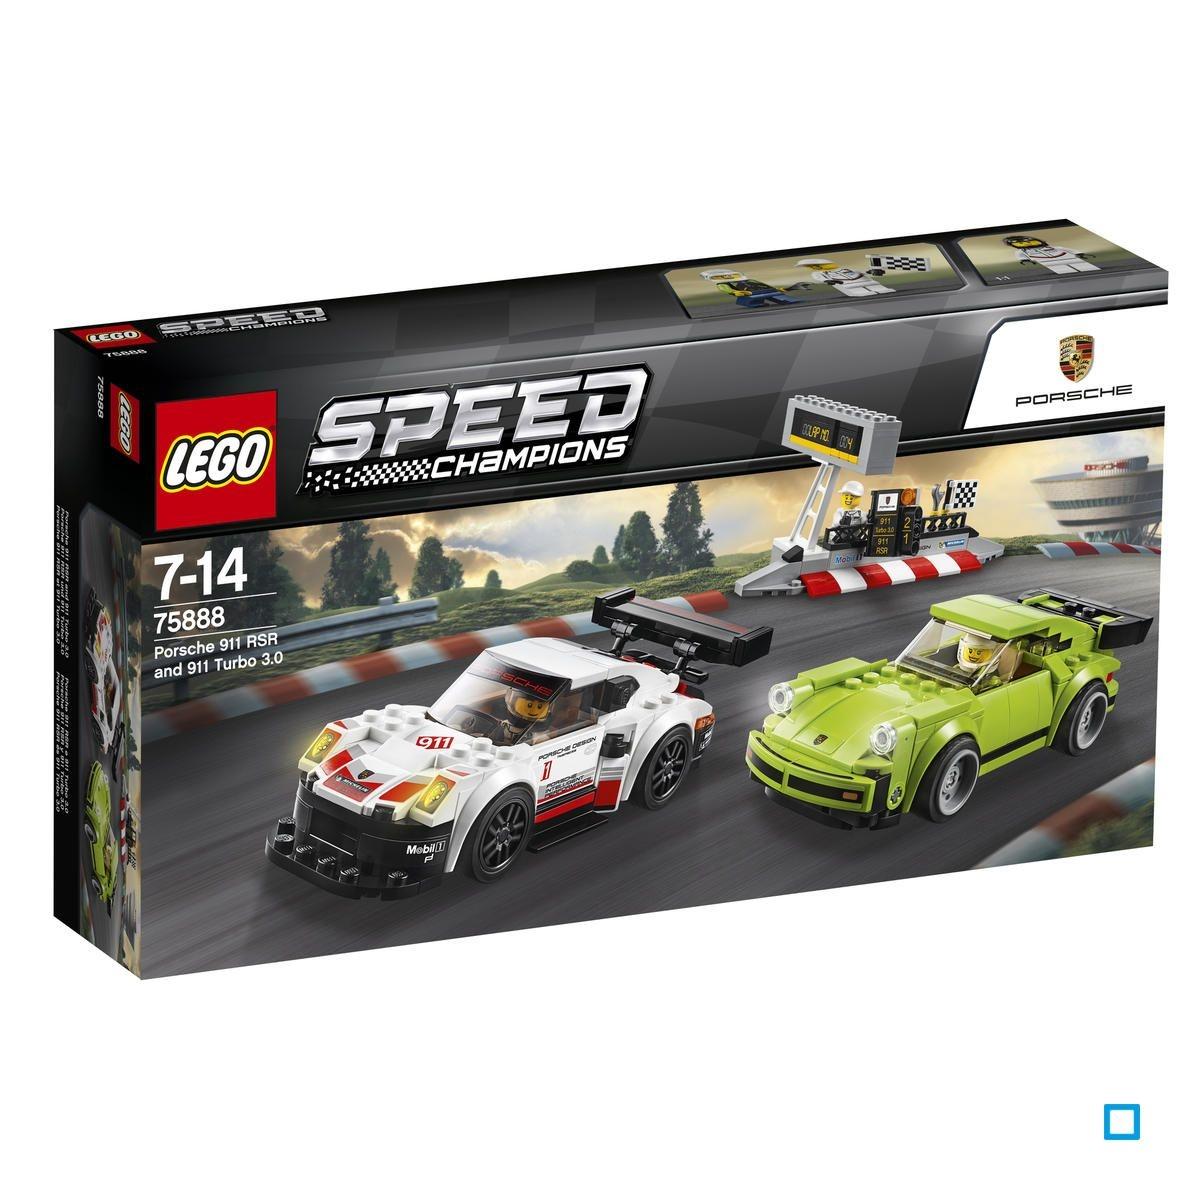 Porsche 911 RSR et 911 Turbo 3.0 - LEG75888